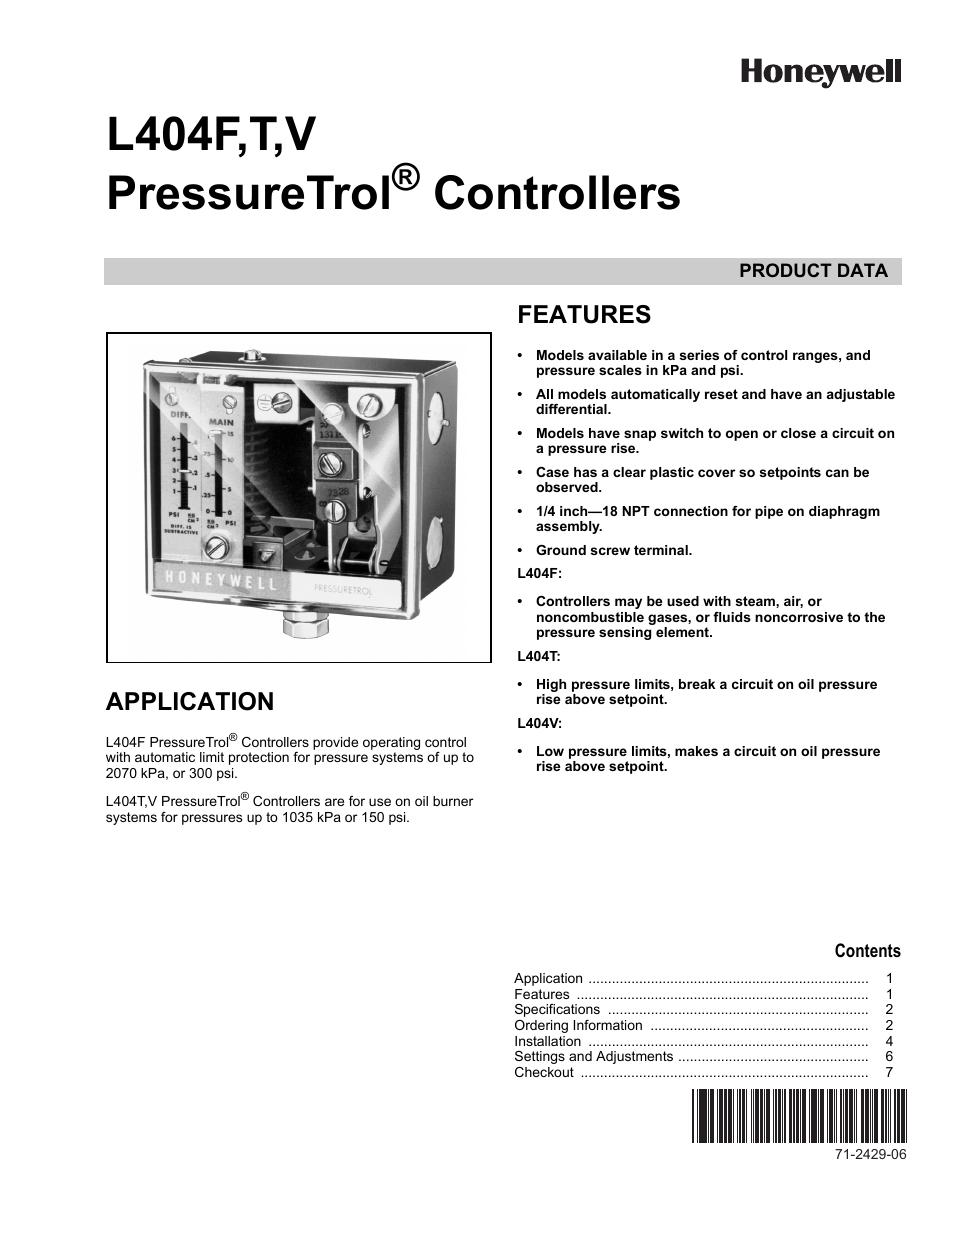 honeywell pressuretrol l404t user manual